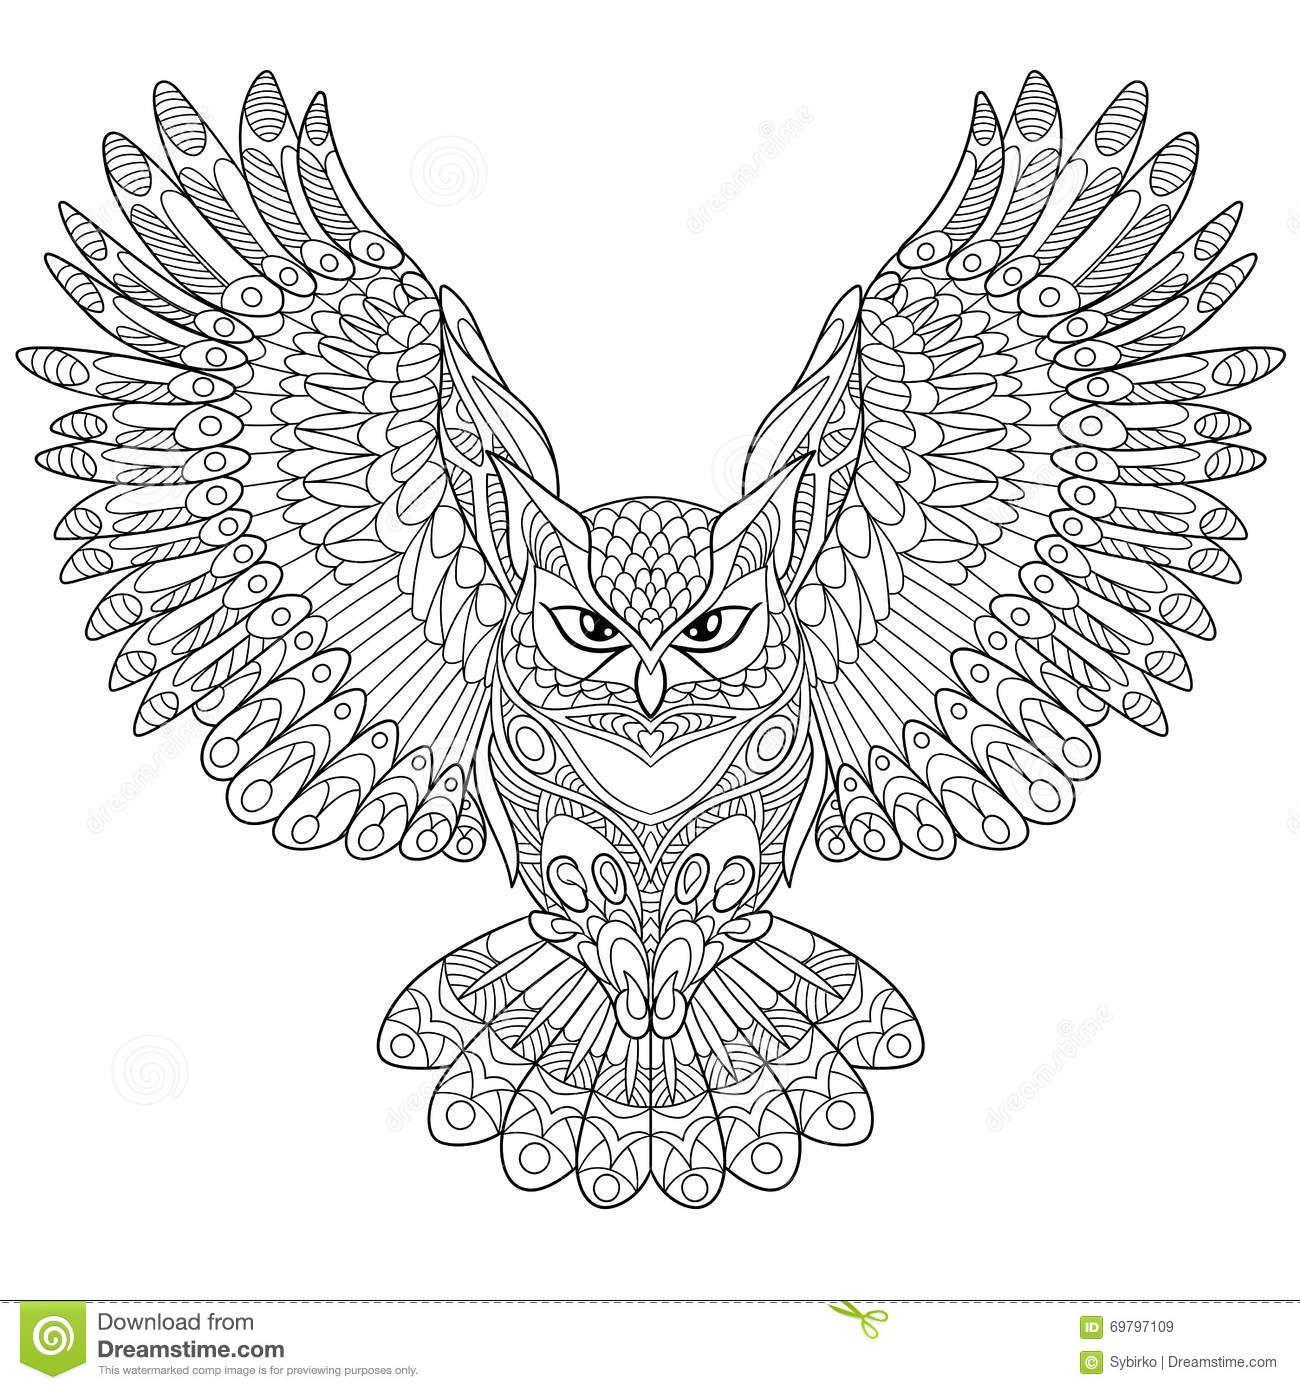 Zentangle Stylized Eagle Owl Stock Vector - Image: 69797109 | СОВЫ ...